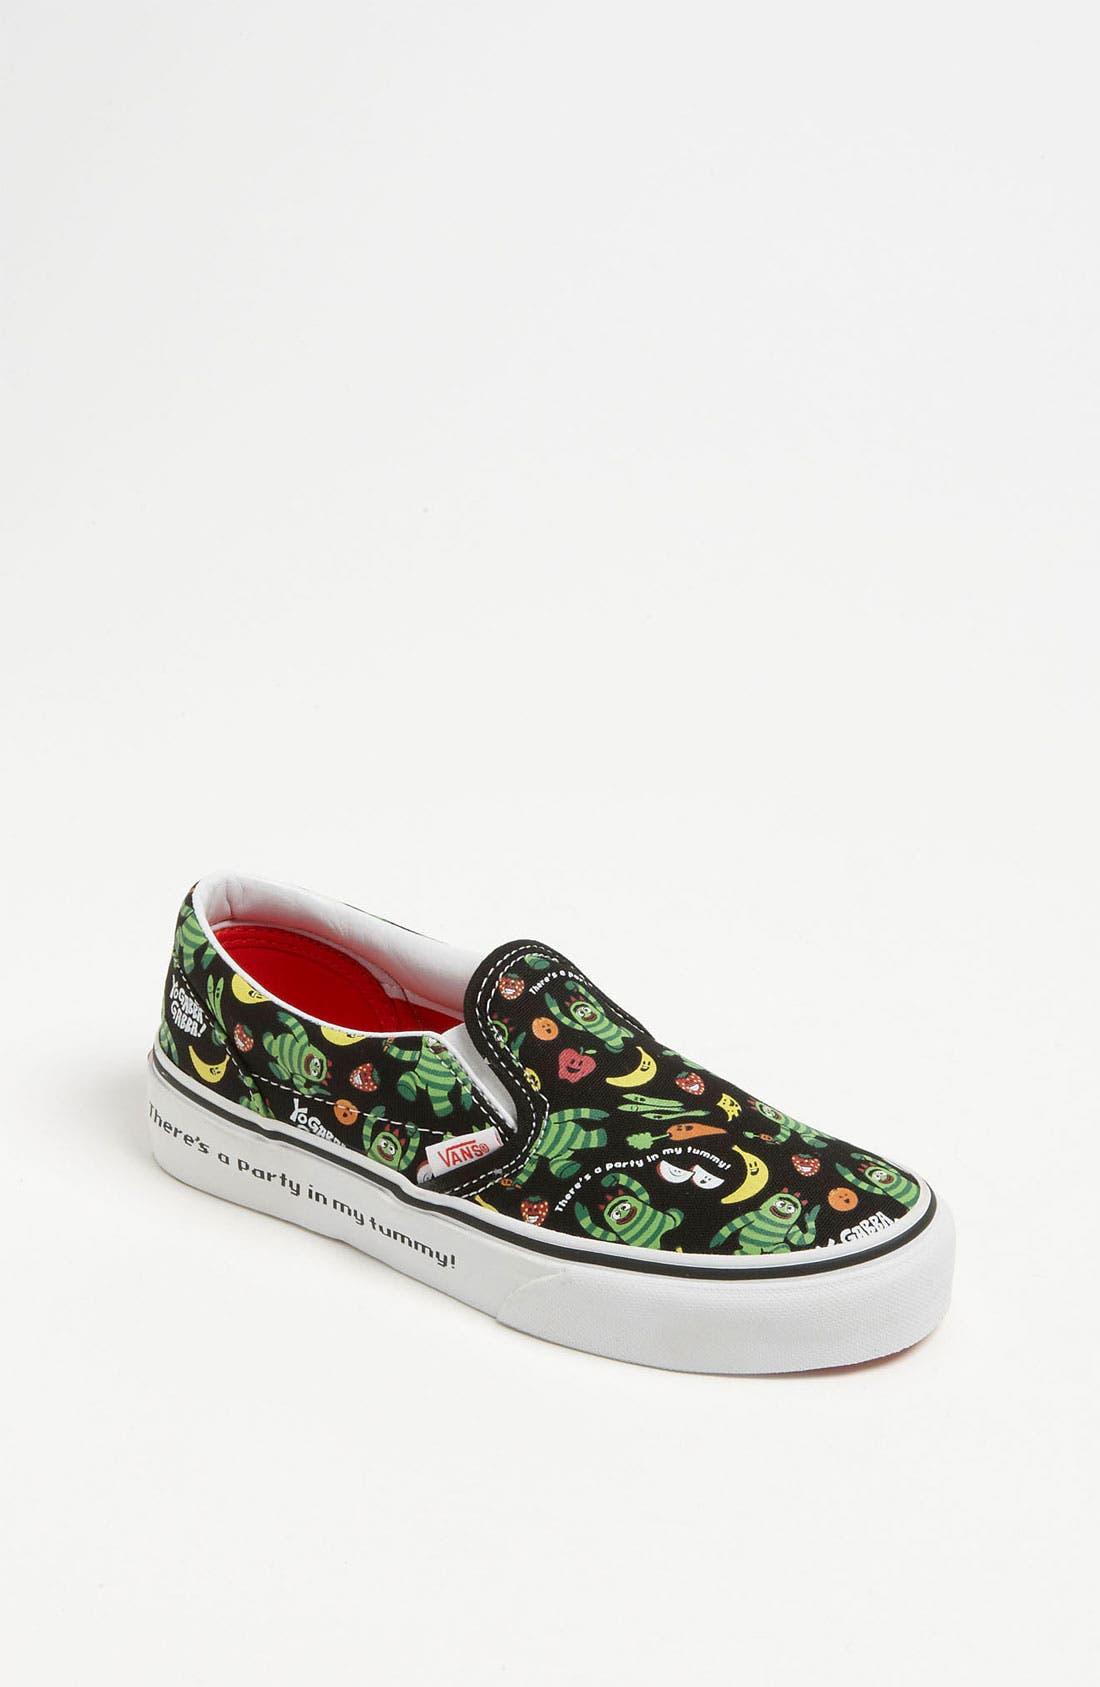 Alternate Image 1 Selected - Vans 'Classic - Yo Gabba Gabba!™' Slip-On Sneaker (Toddler, Little Kid & Big Kid)